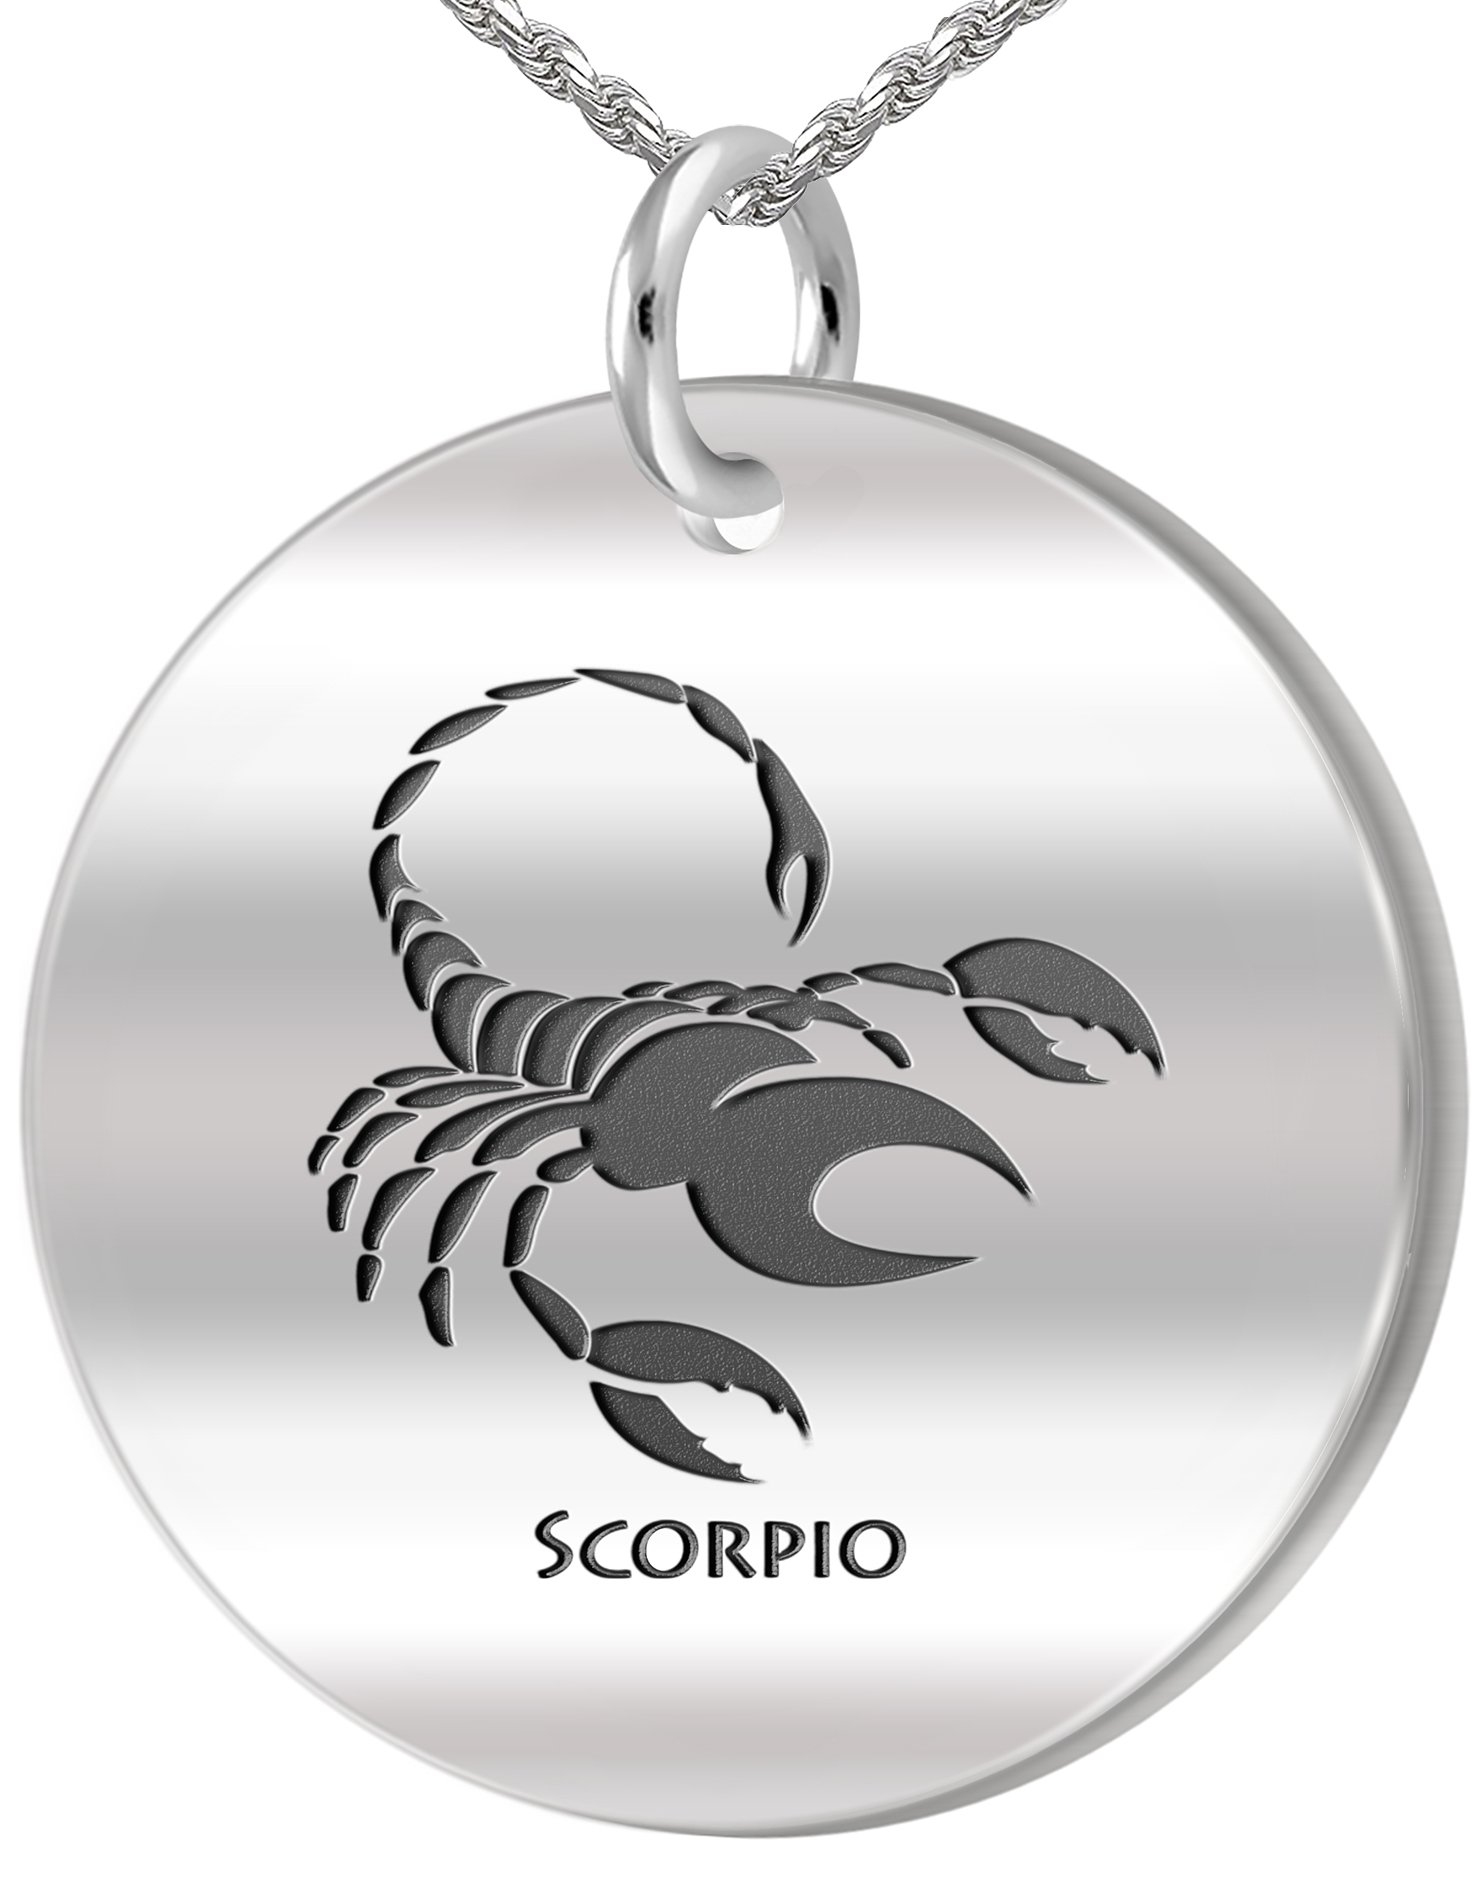 0.925 Sterling Silver 1in Scorpio October & November Zodiac Pendant 3.3mm Rope Necklace, 24in